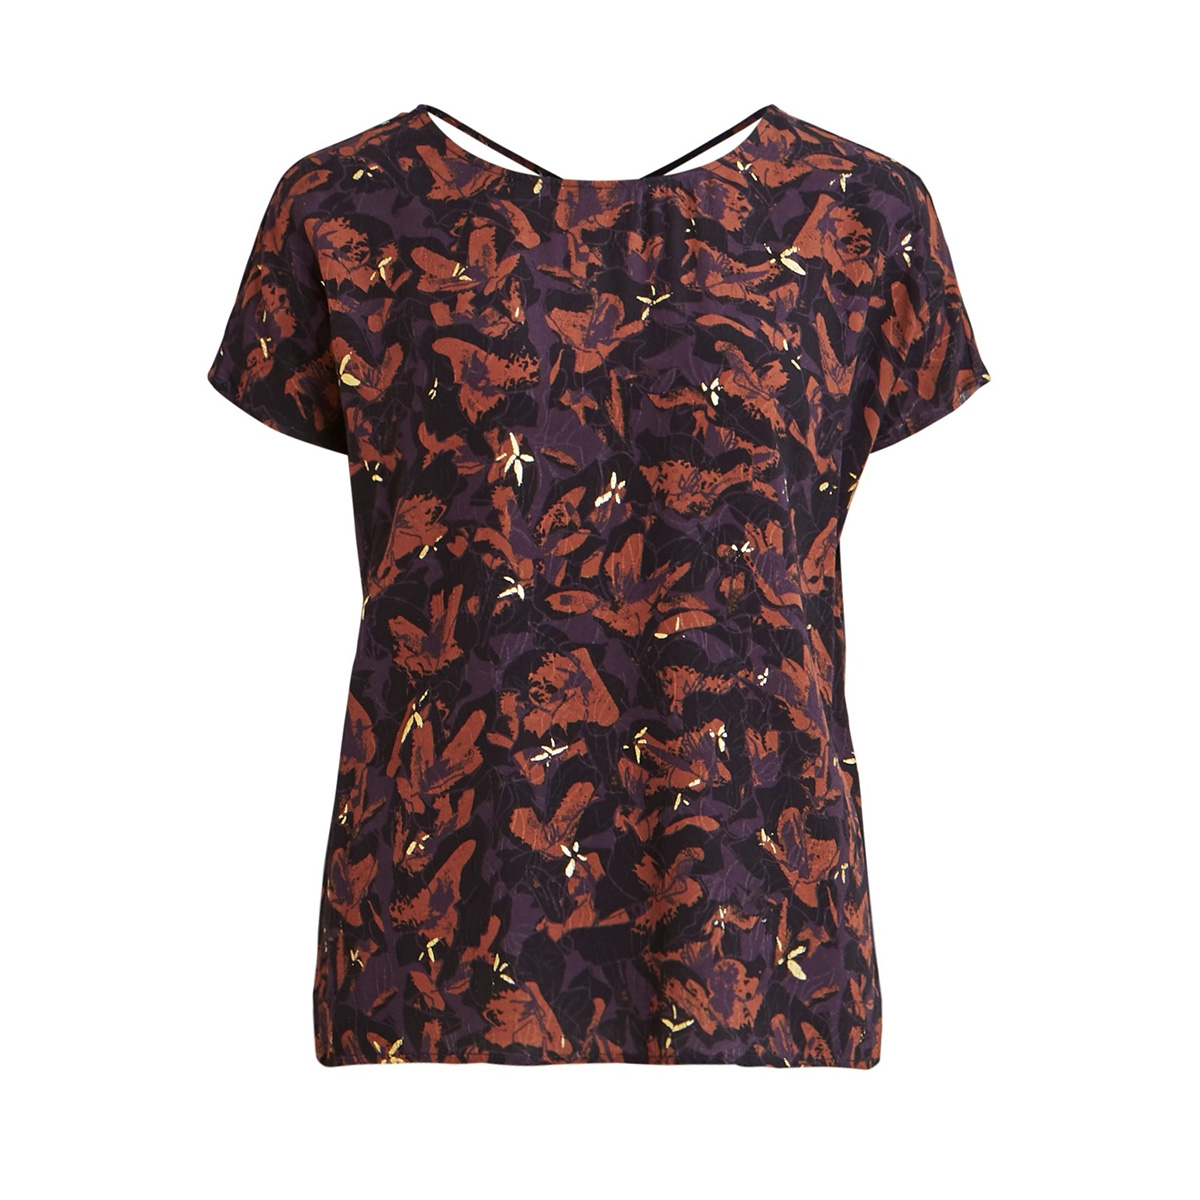 objelma clarissa ss top 106 23031109 object t-shirt nightshade